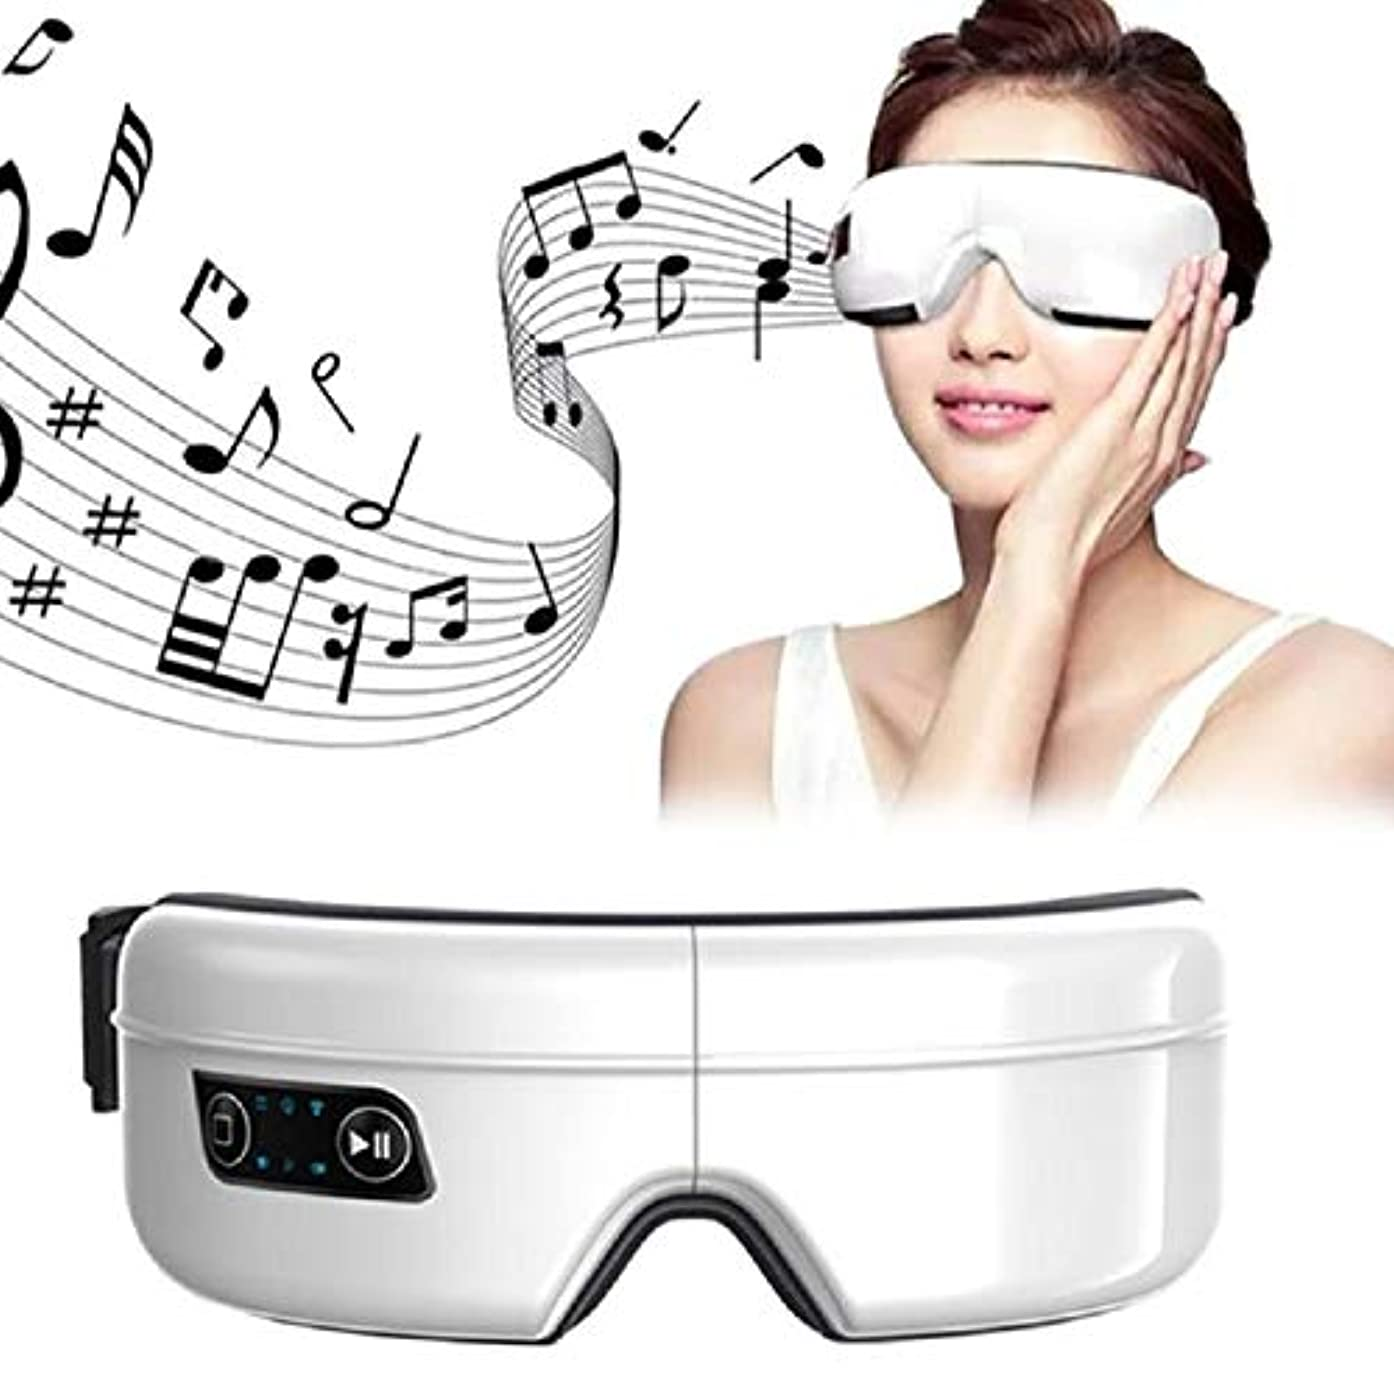 Meet now 高度な電気ワイヤレスアイマッサージSPAの楽器、音楽充電式美容ツール 品質保証